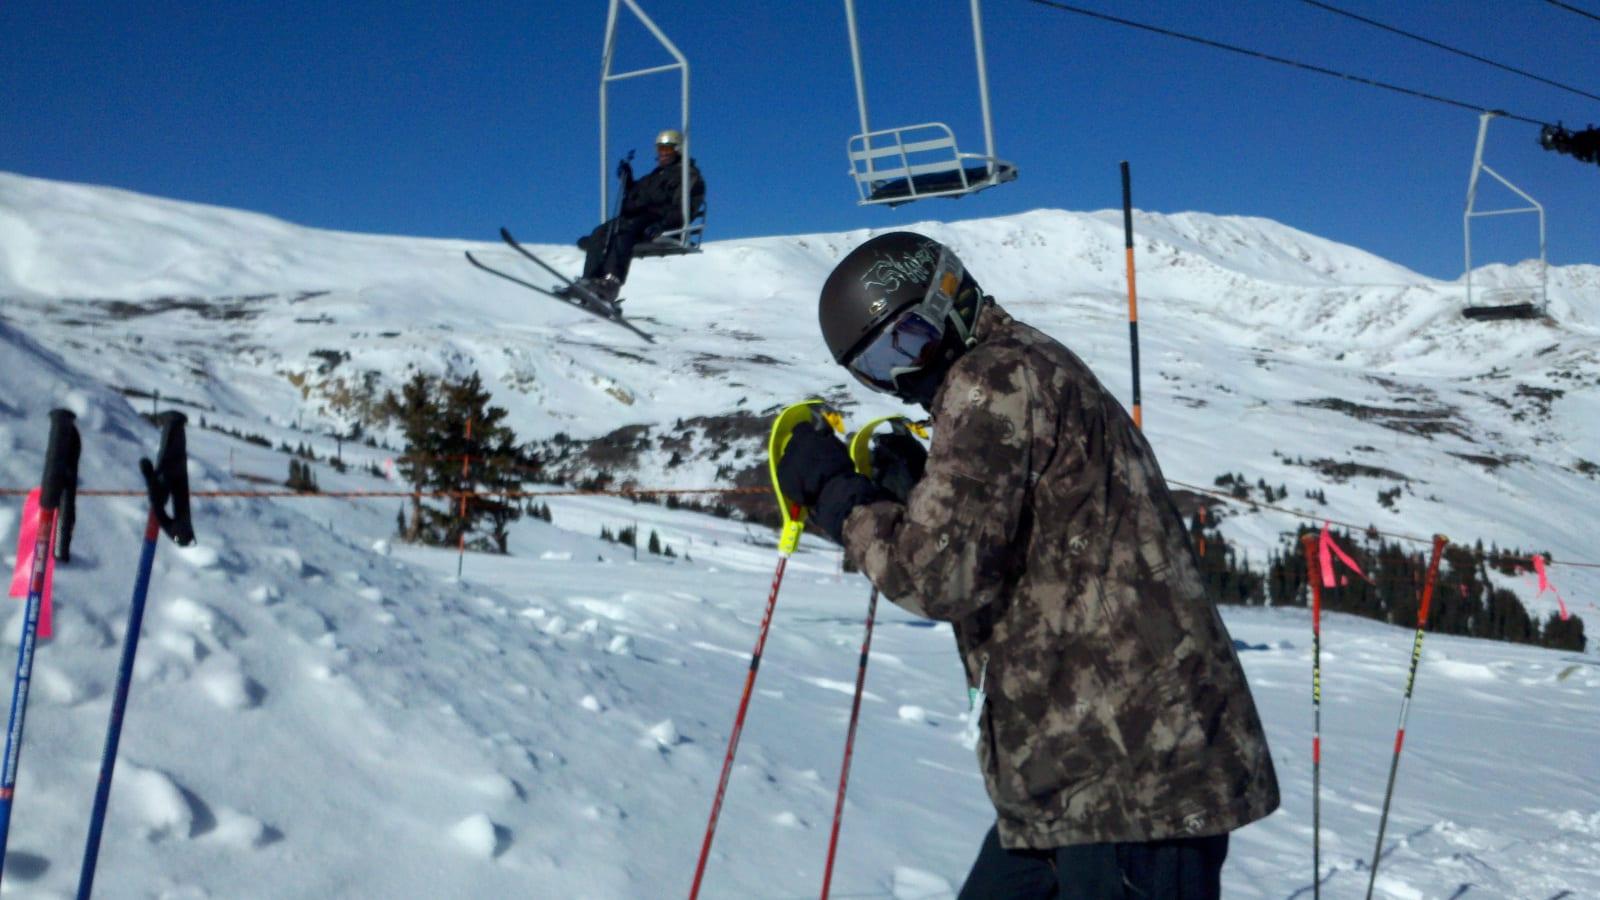 Loveland Ski Area Snowboarder Ski Poles